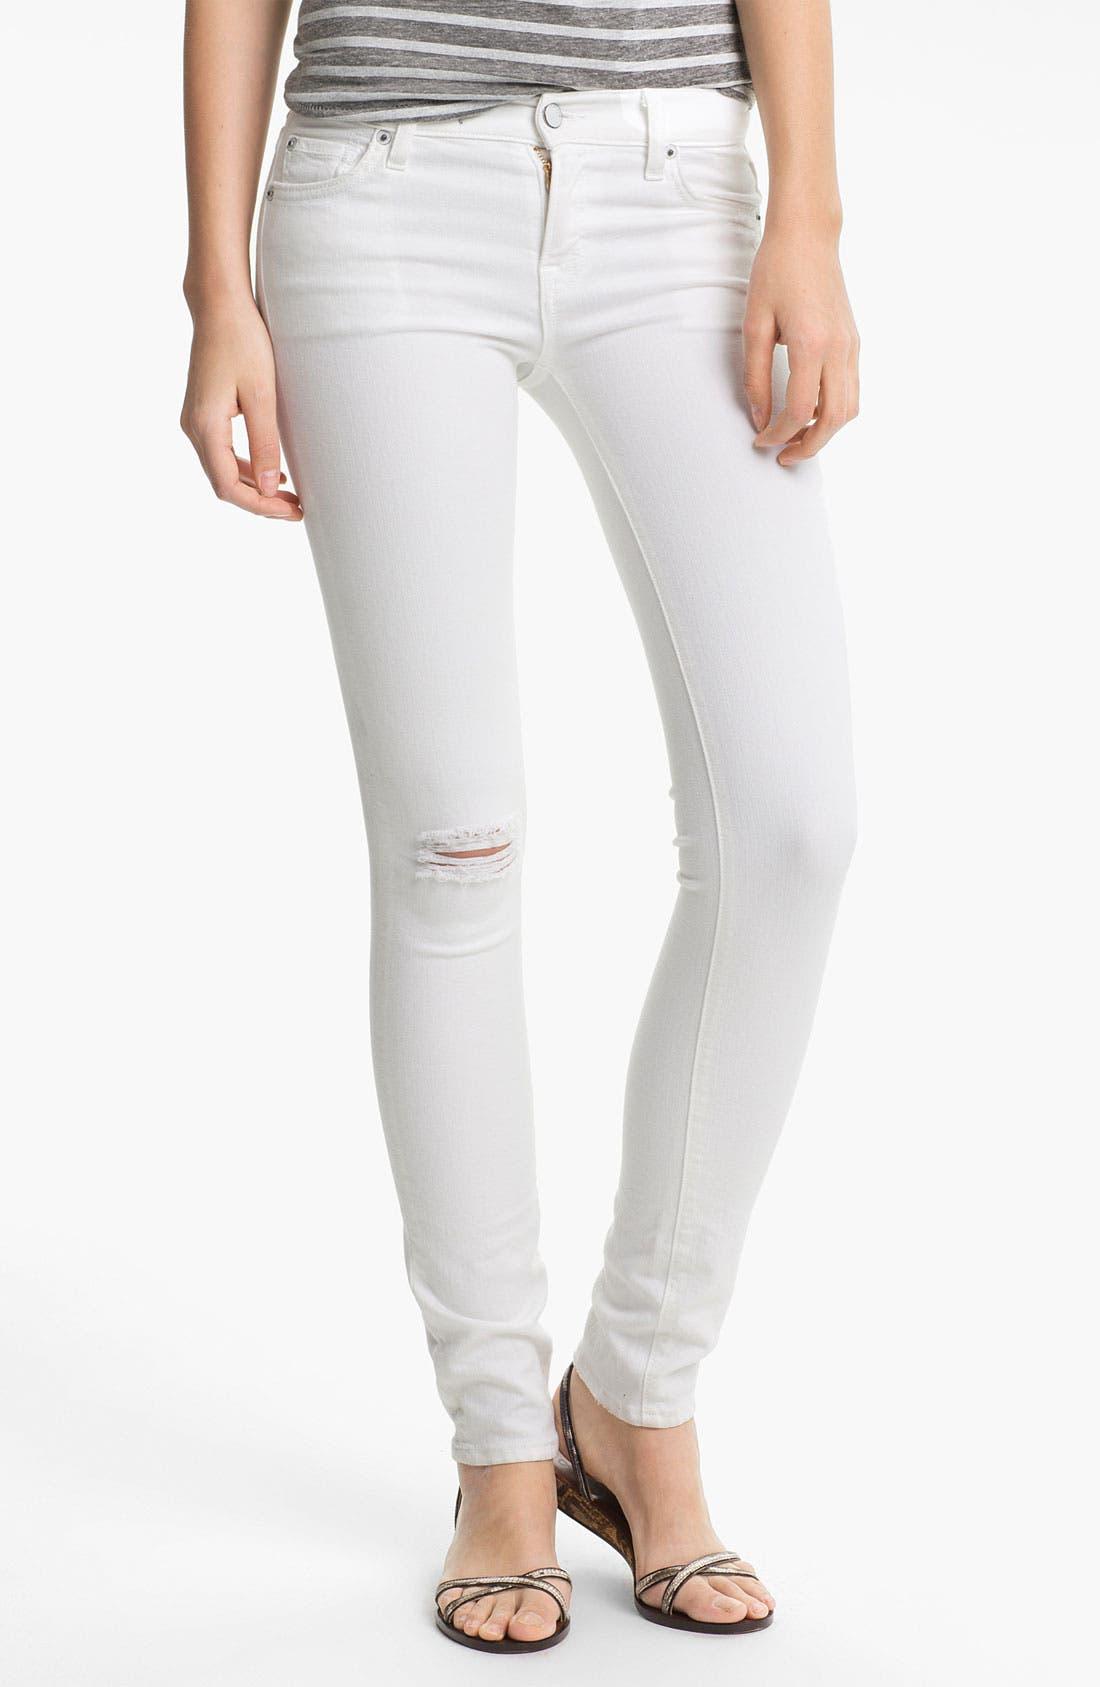 Main Image - TEXTILE Elizabeth and James 'Debbie' Skinny Stretch Jeans